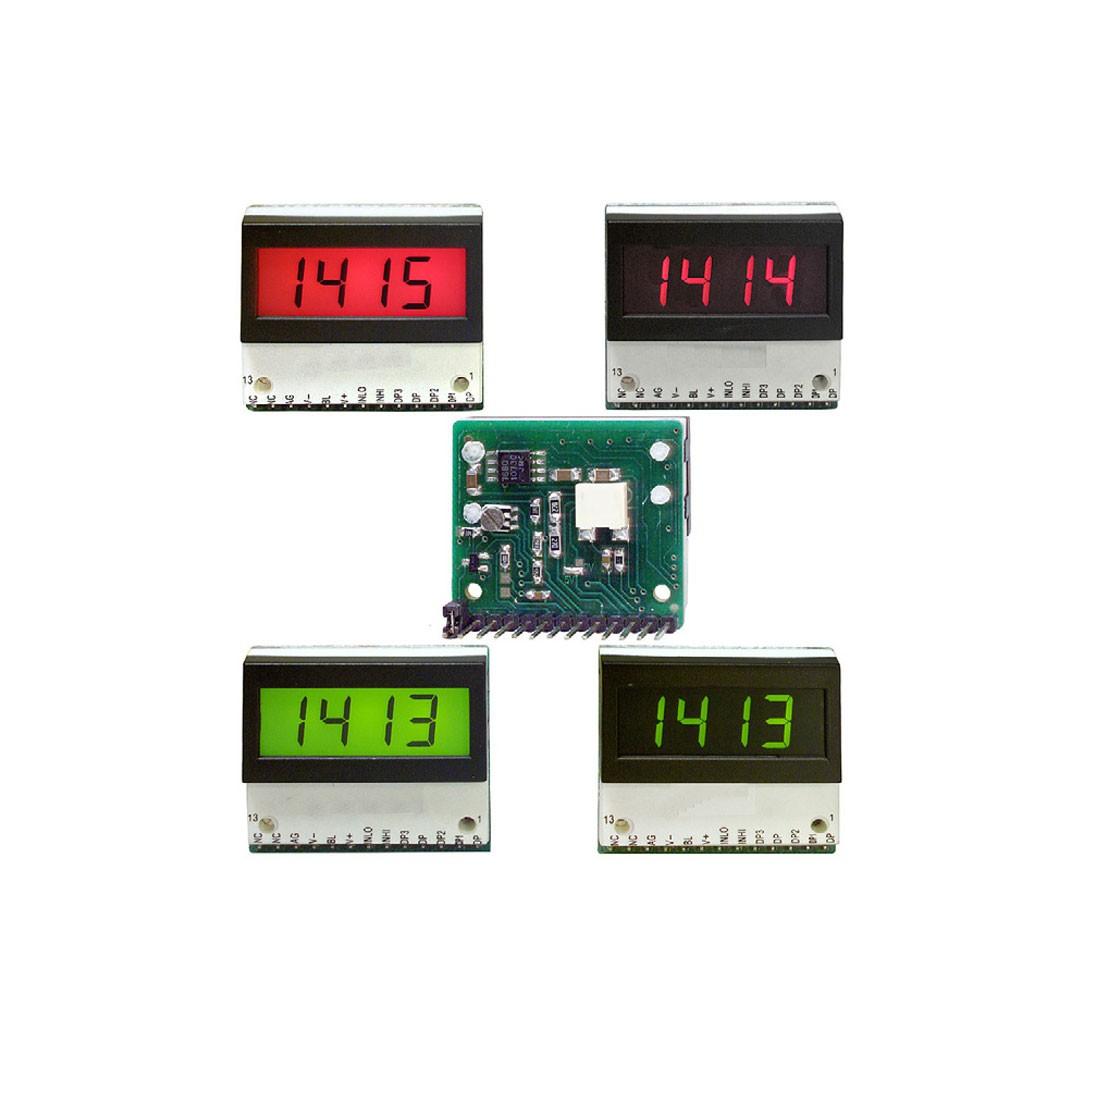 H7M Series LCD Digital Panel Meter